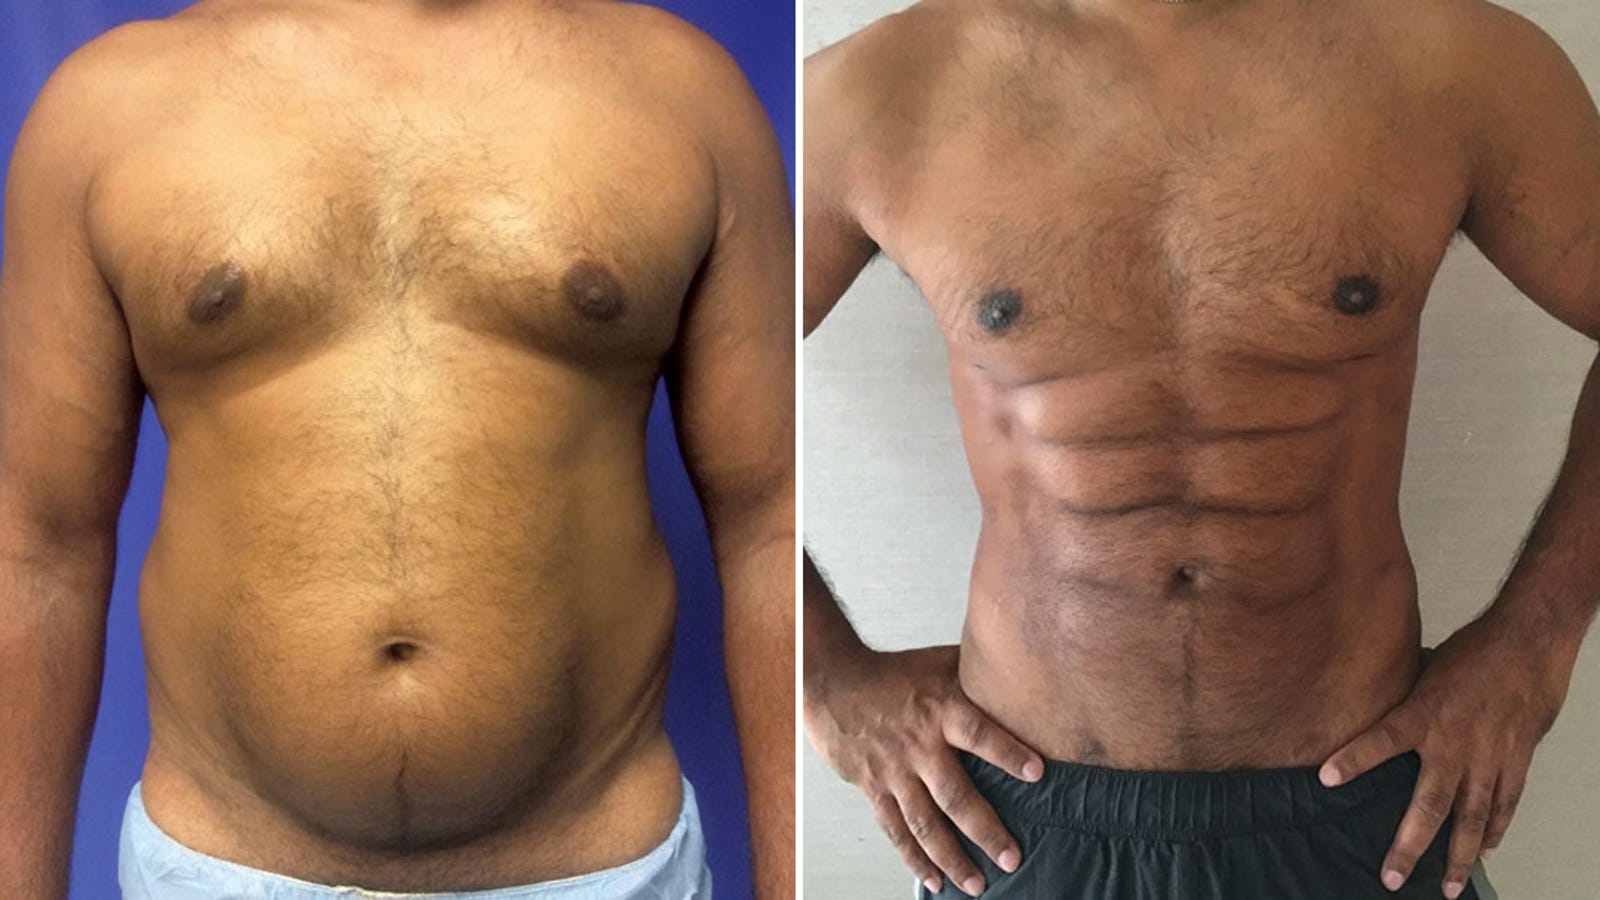 Apr 28 - Plastic Surgeons Can Now Sculpt Belly Fat Into a